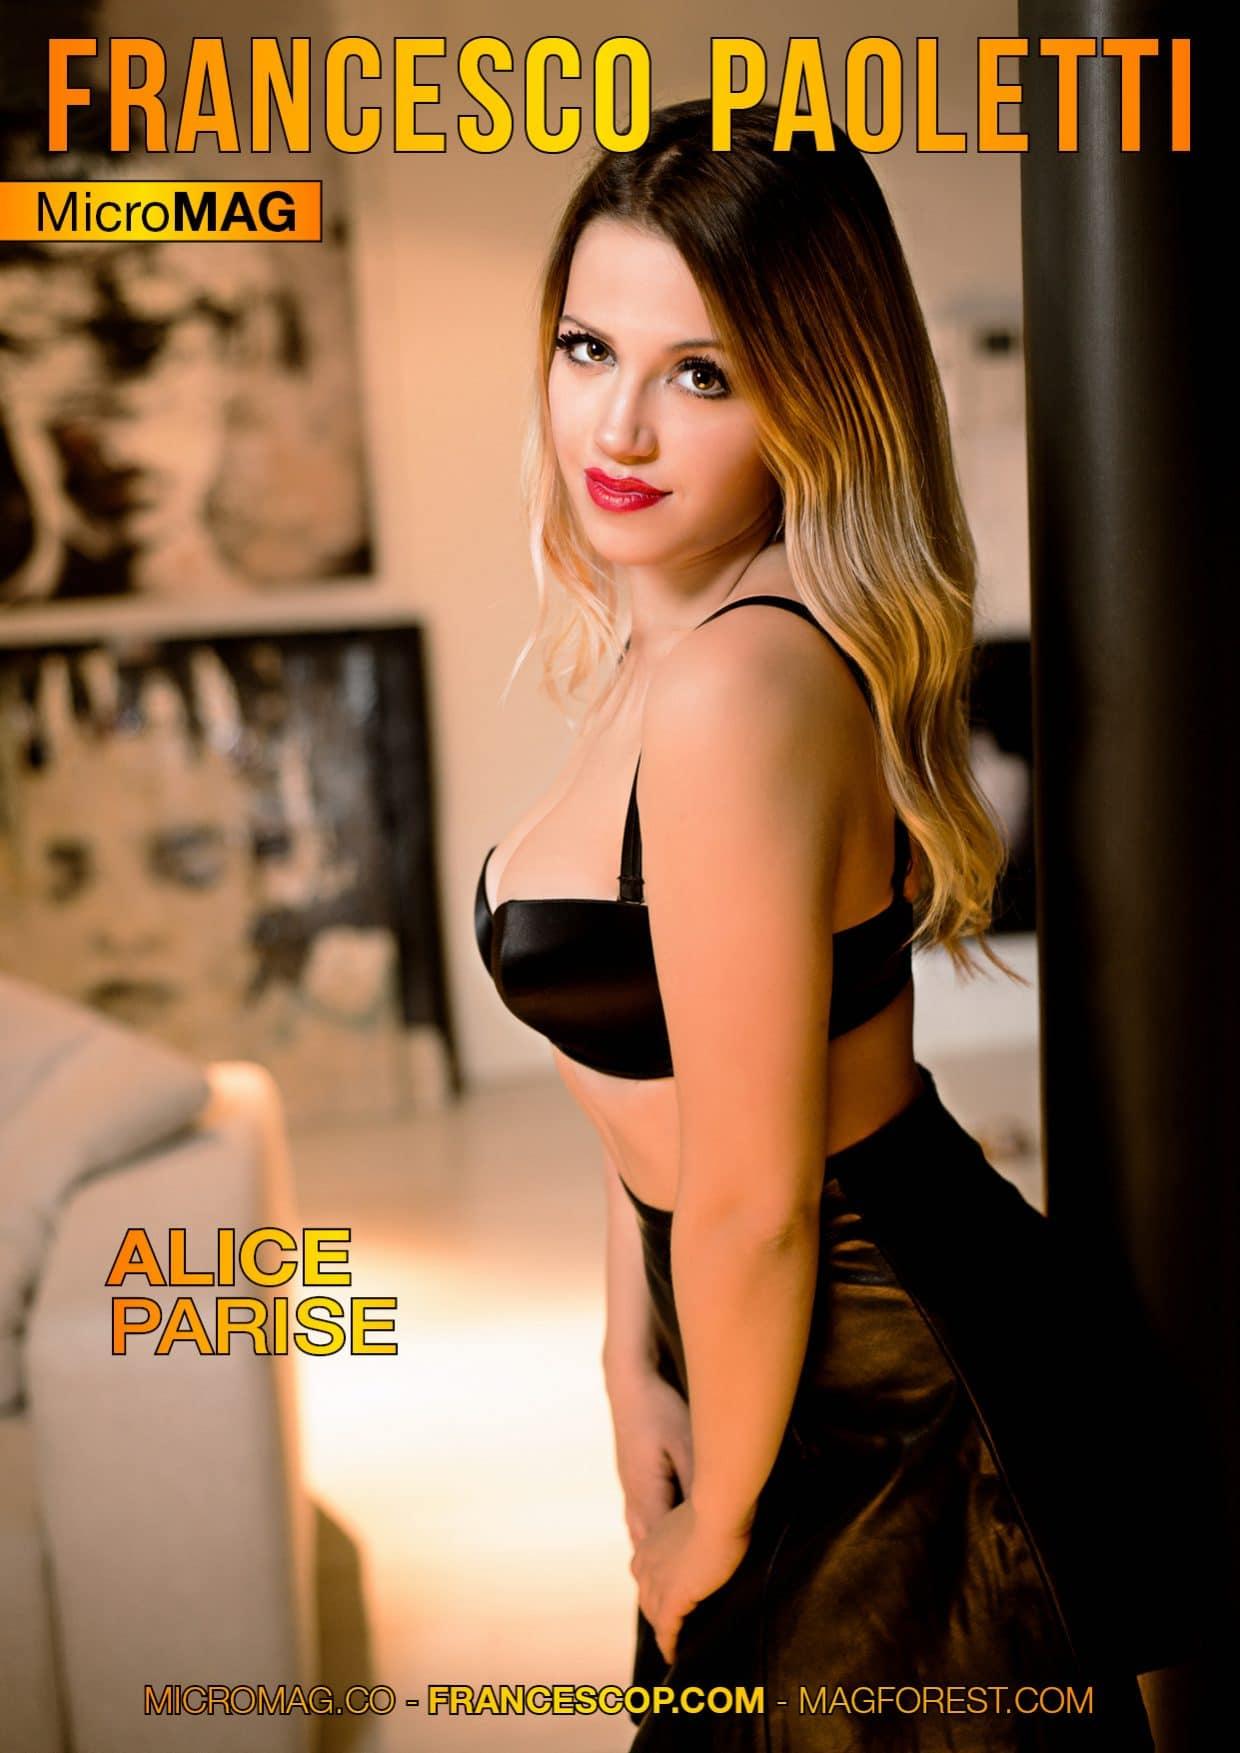 Francesco Paoletti MicroMAG - Alice Parise 1